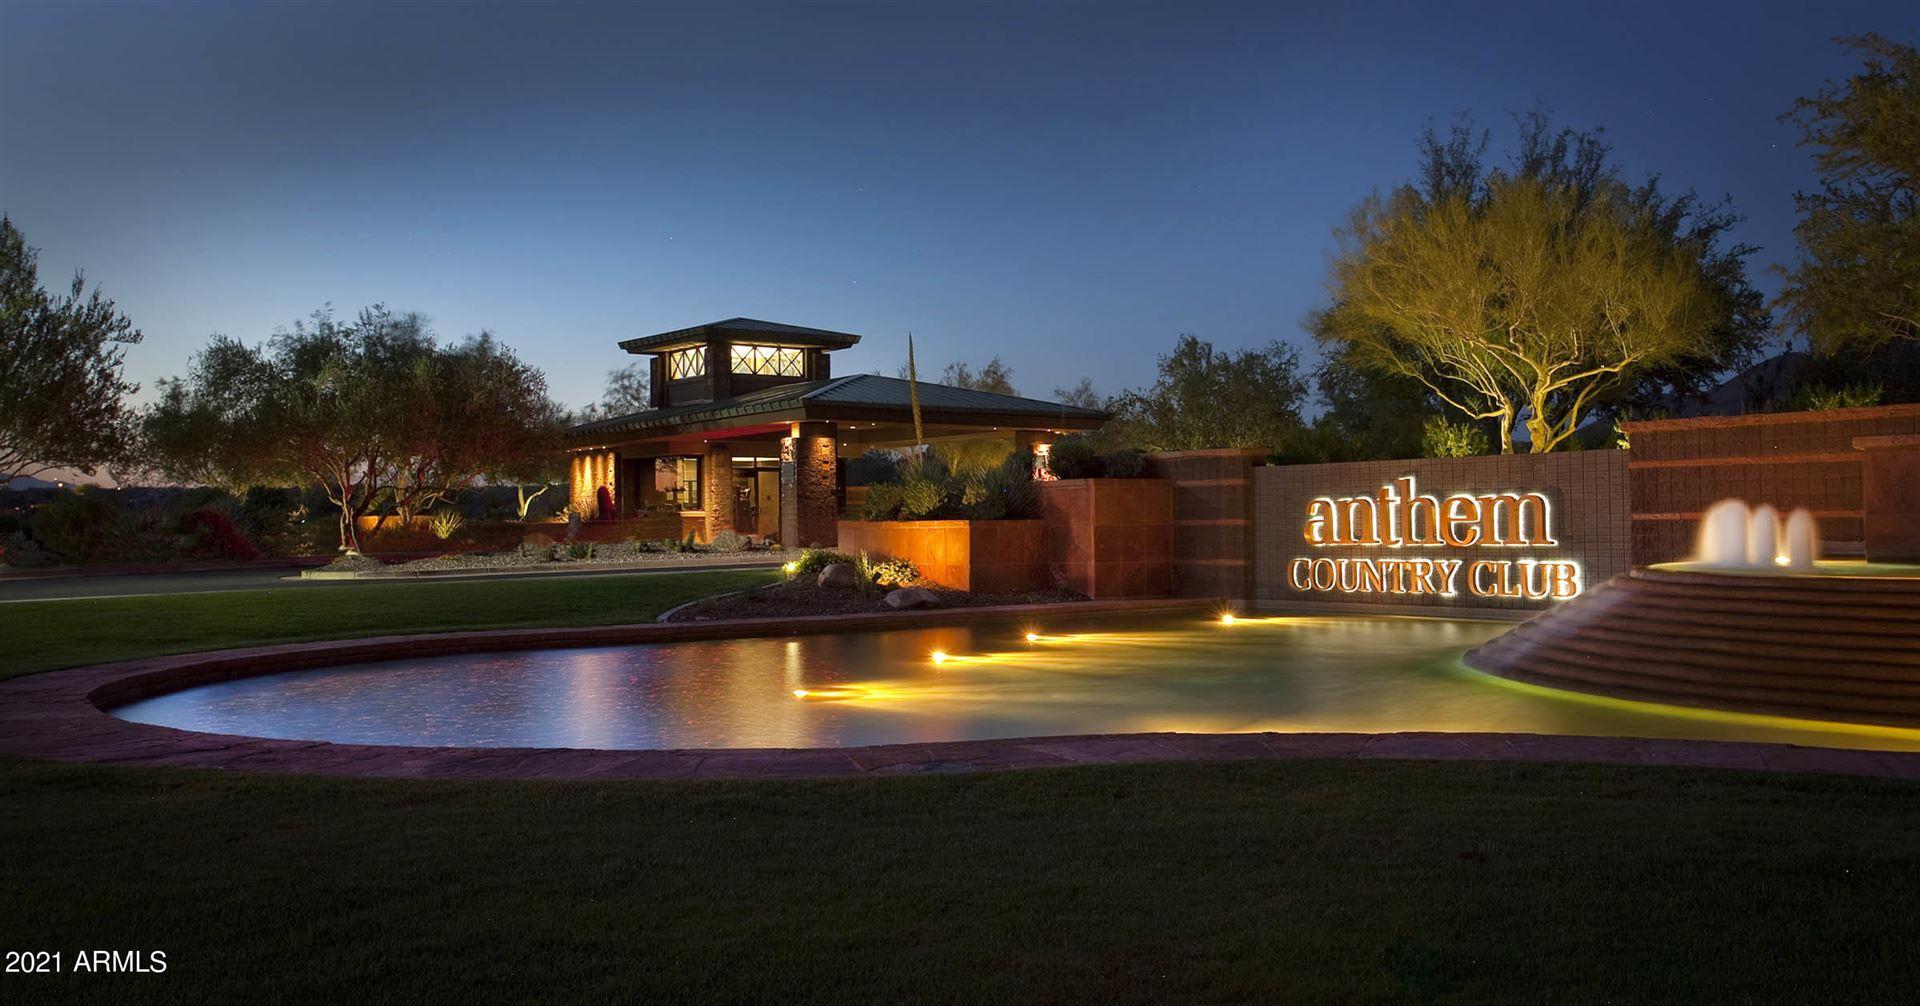 Photo of 41623 N LAUREL VALLEY Way, Anthem, AZ 85086 (MLS # 6224700)